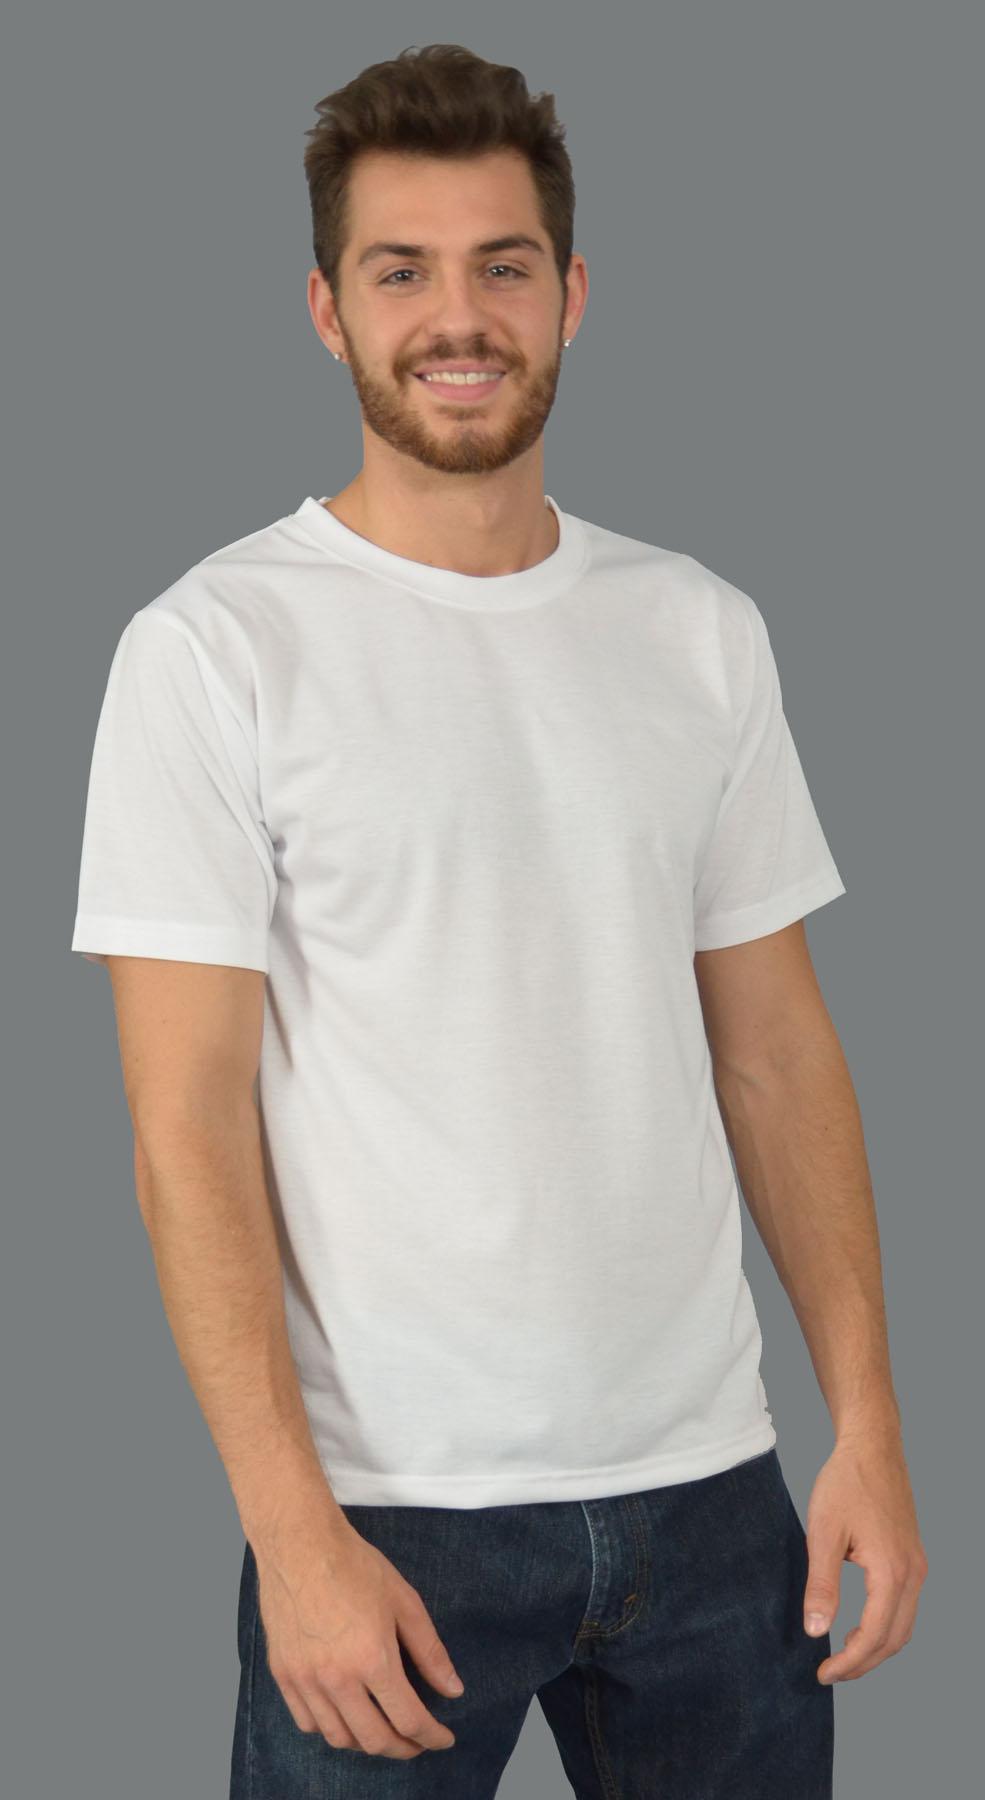 Monag 943001 - Short Sleeve Crew Neck Cotton/Poly